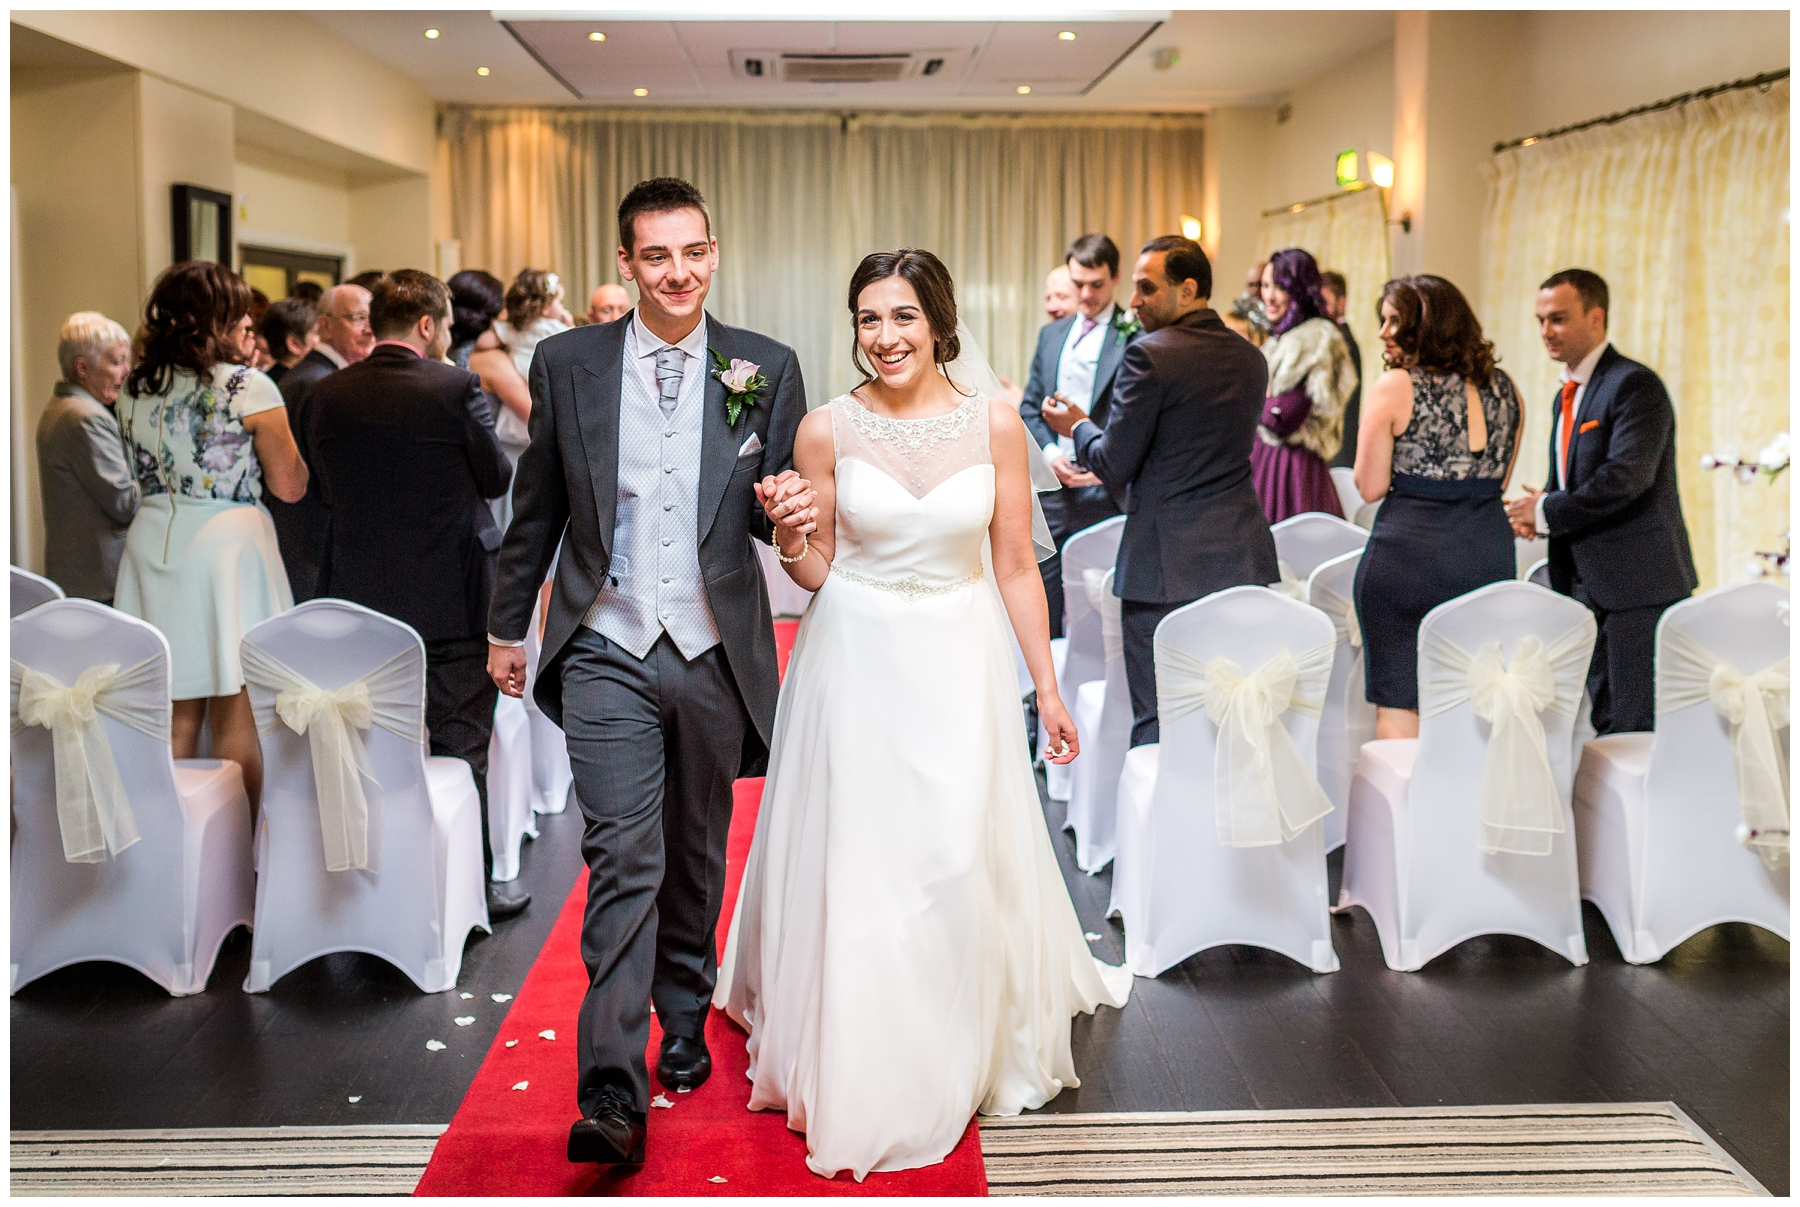 holland-hall-wedding-photography-becky-jason_0022.jpg